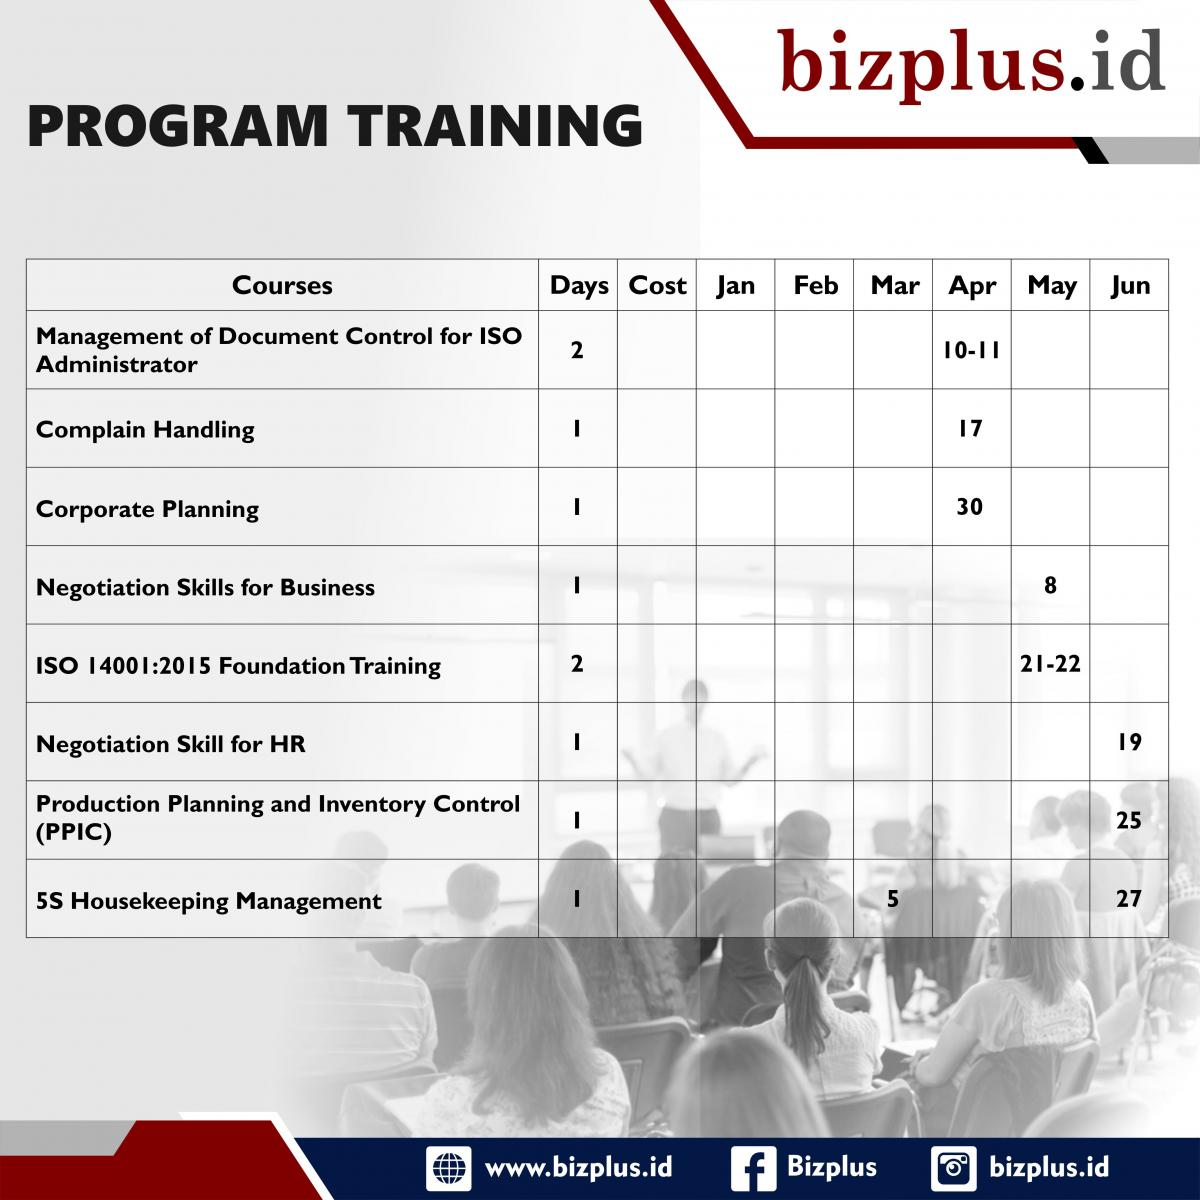 Program Training 2